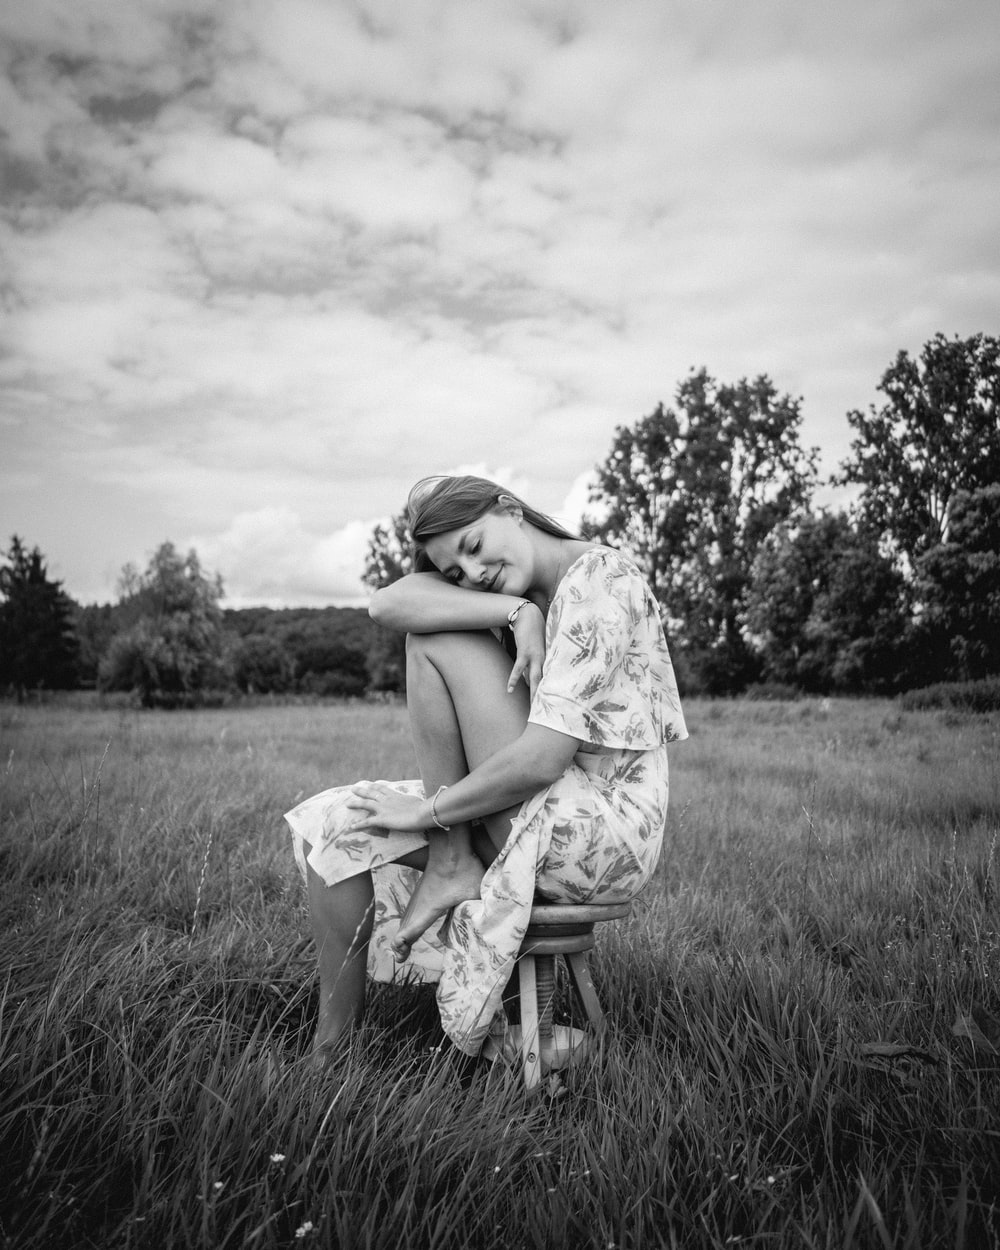 woman in white dress sitting on grass field